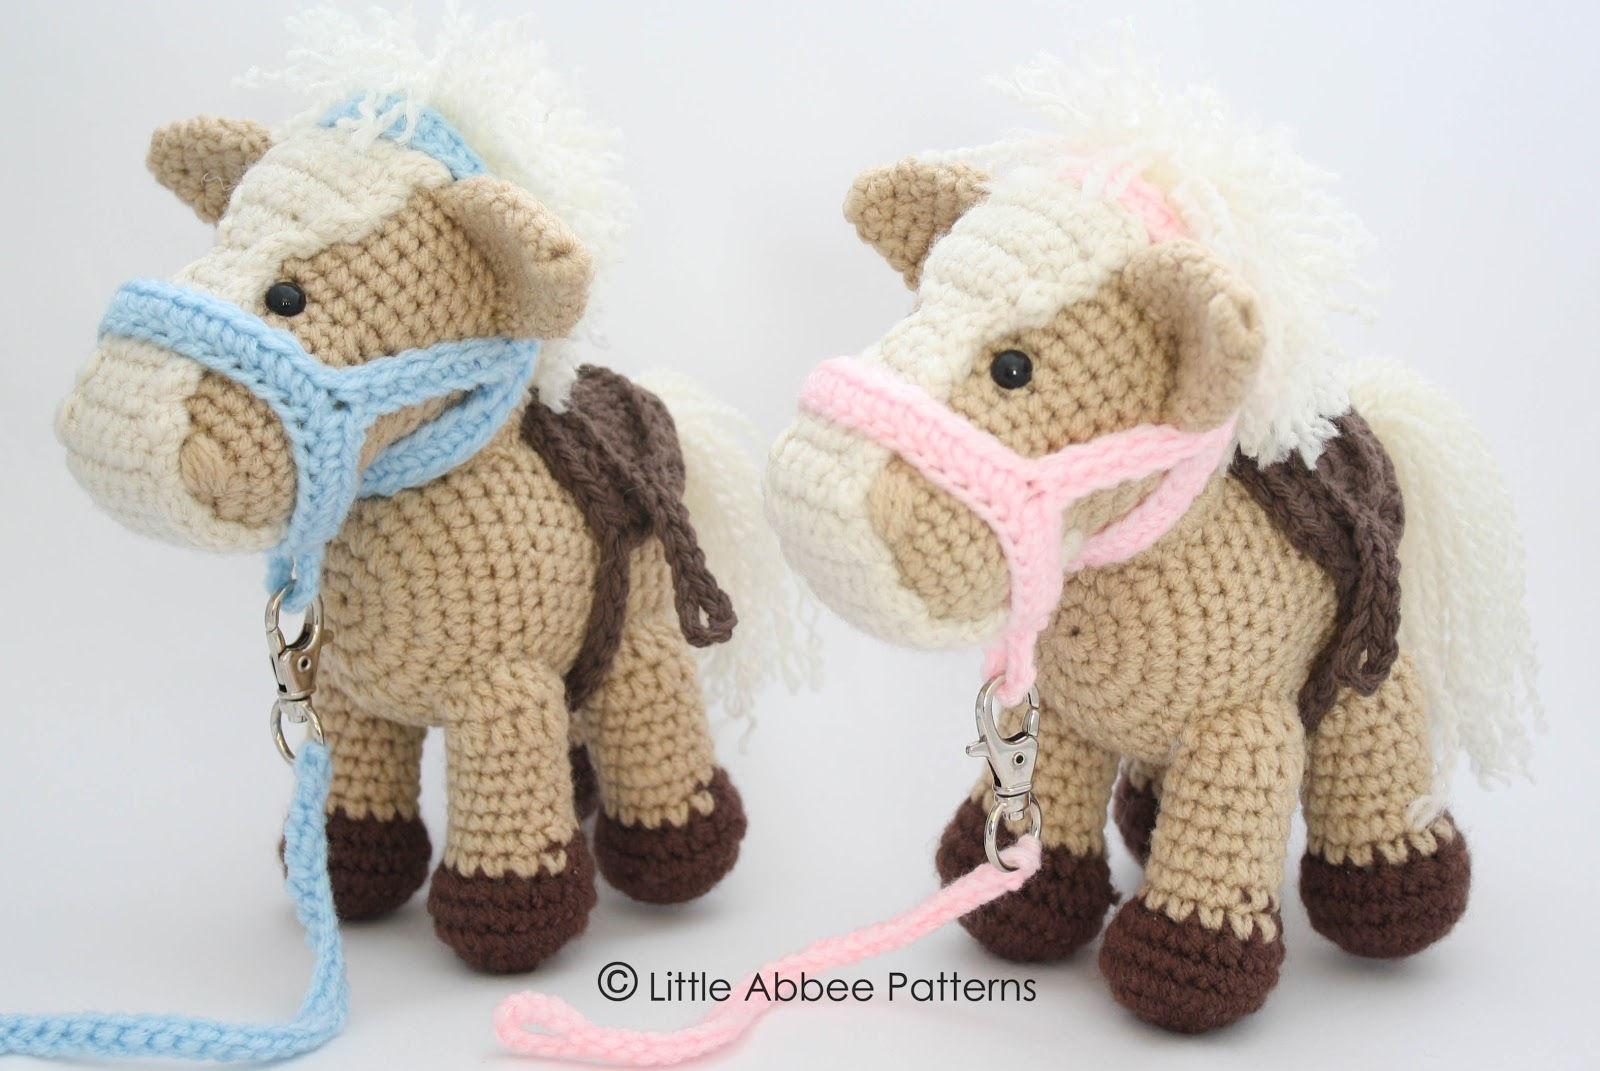 Little Abbee: His and Hers Amigurumi Horses